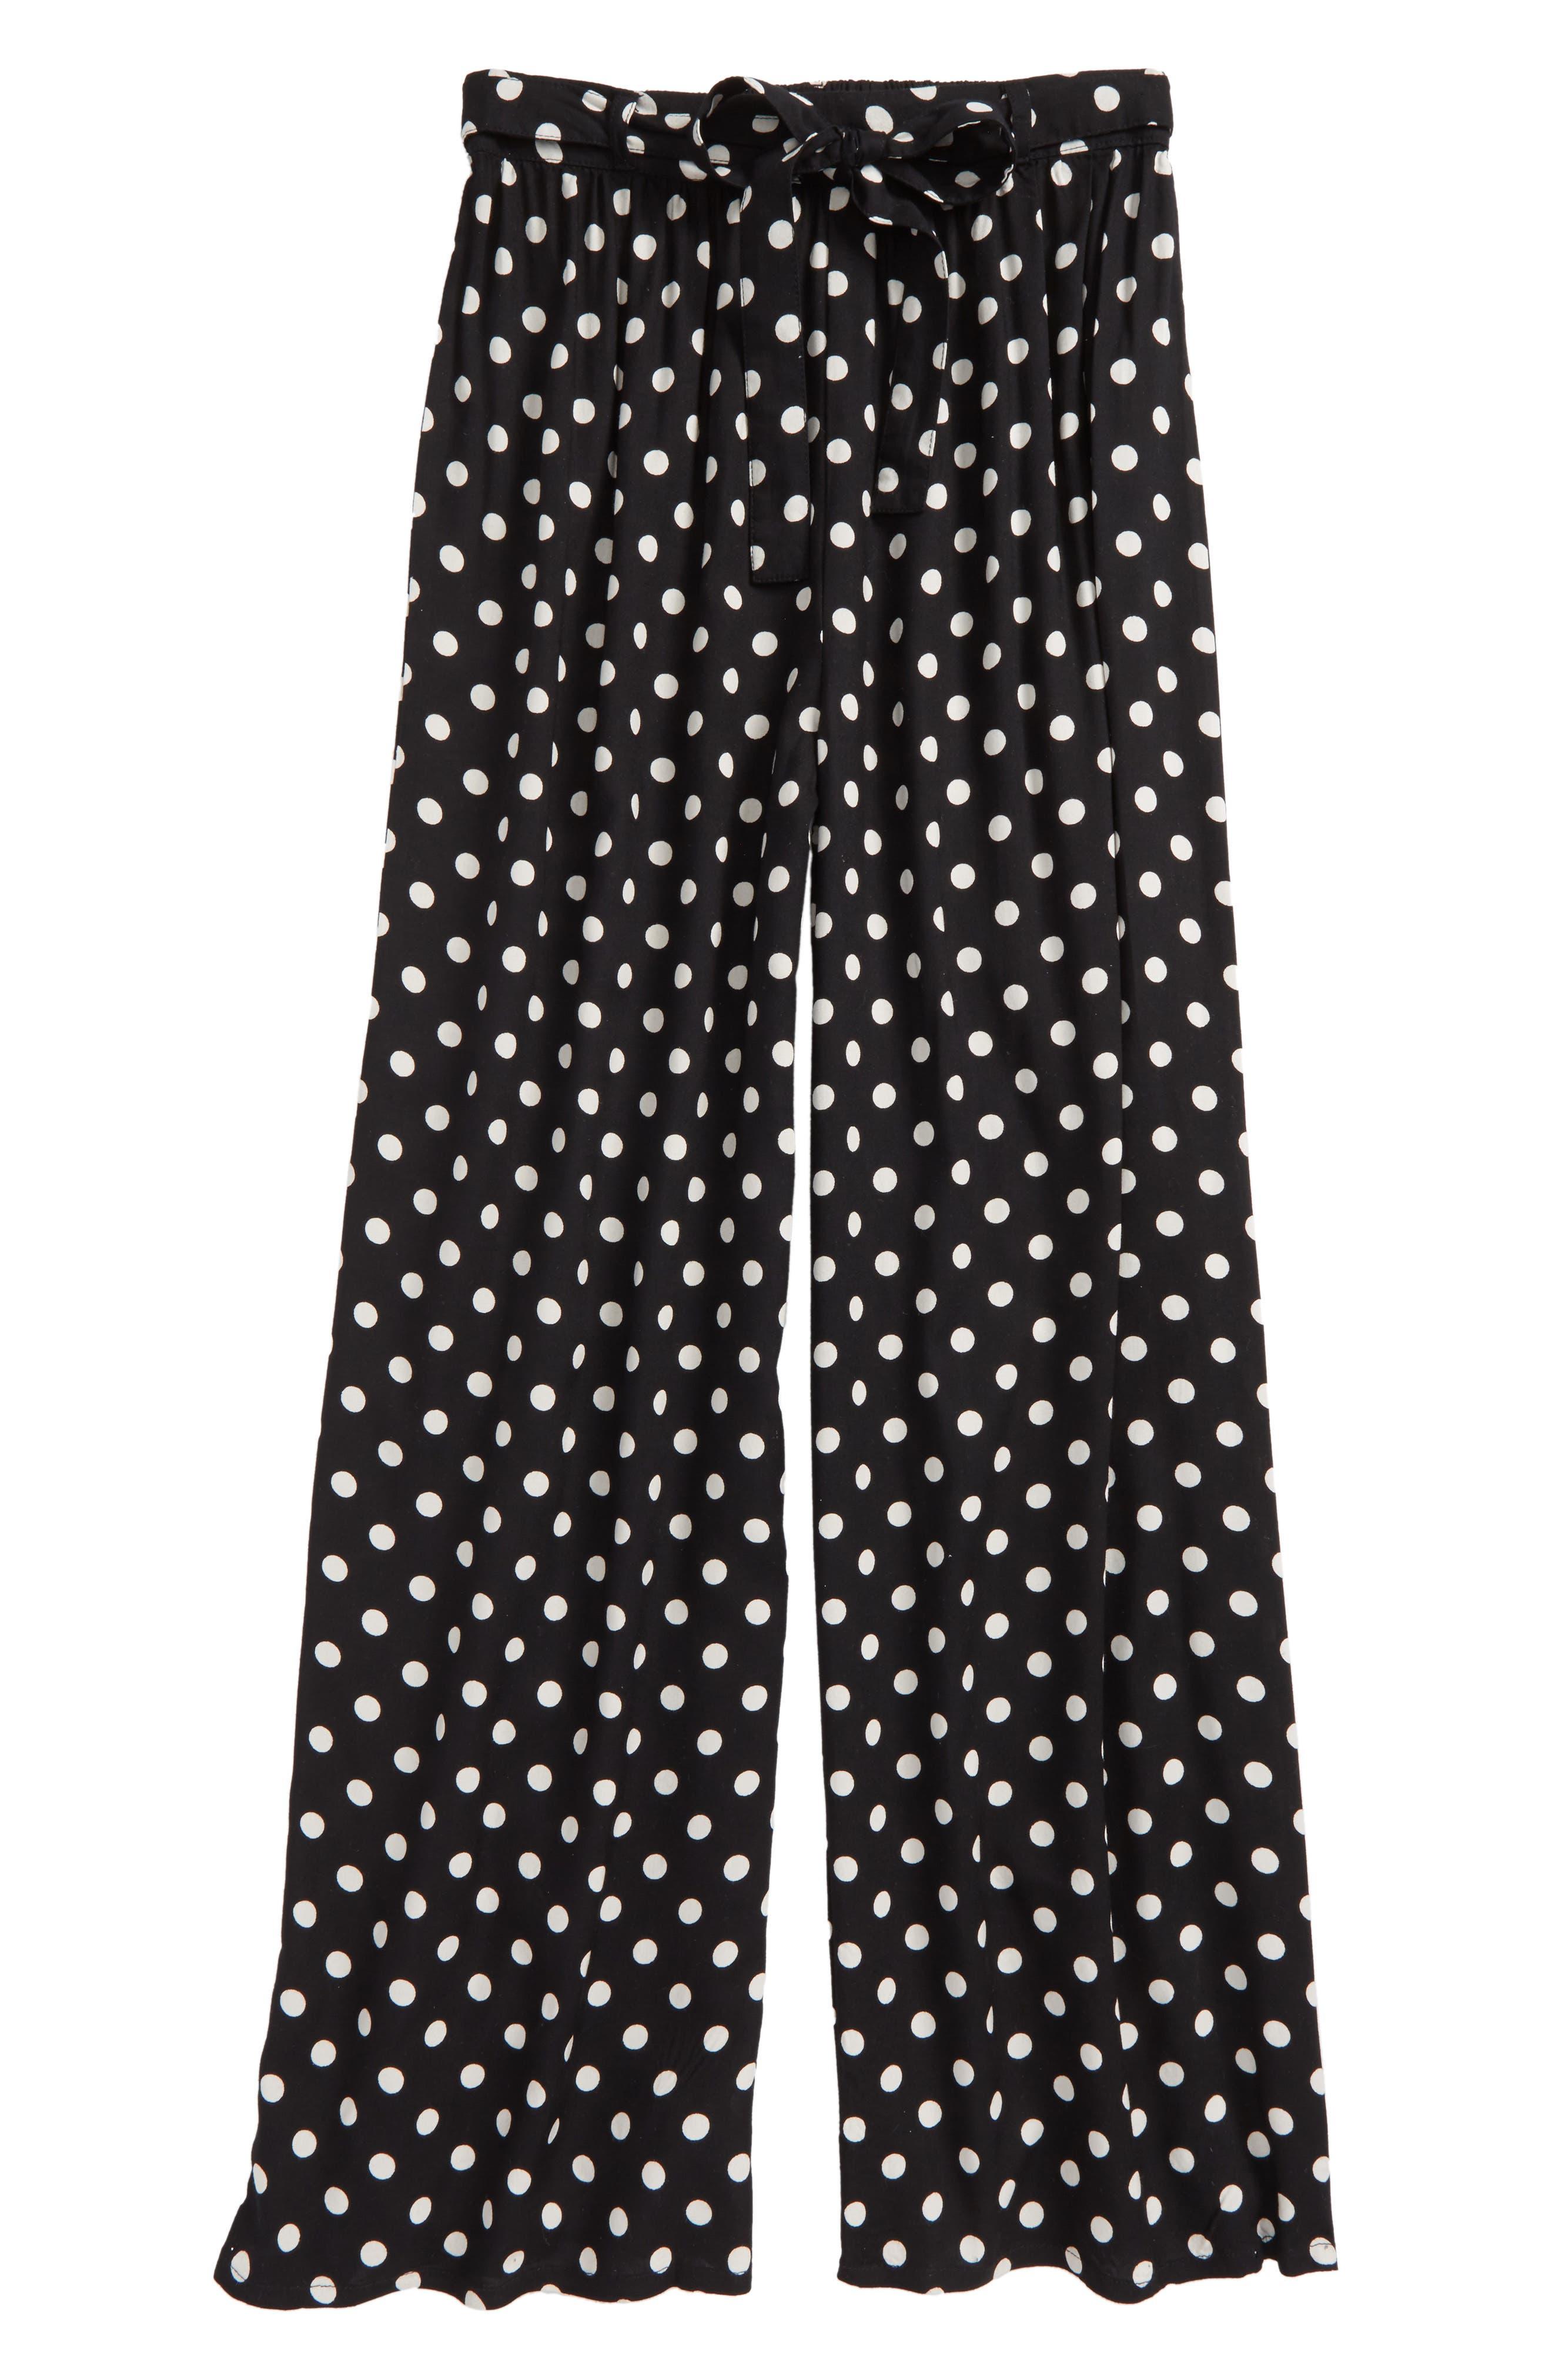 Main Image - Zoe & Rose Polka Dot Wide Leg Pants (Big Girls)